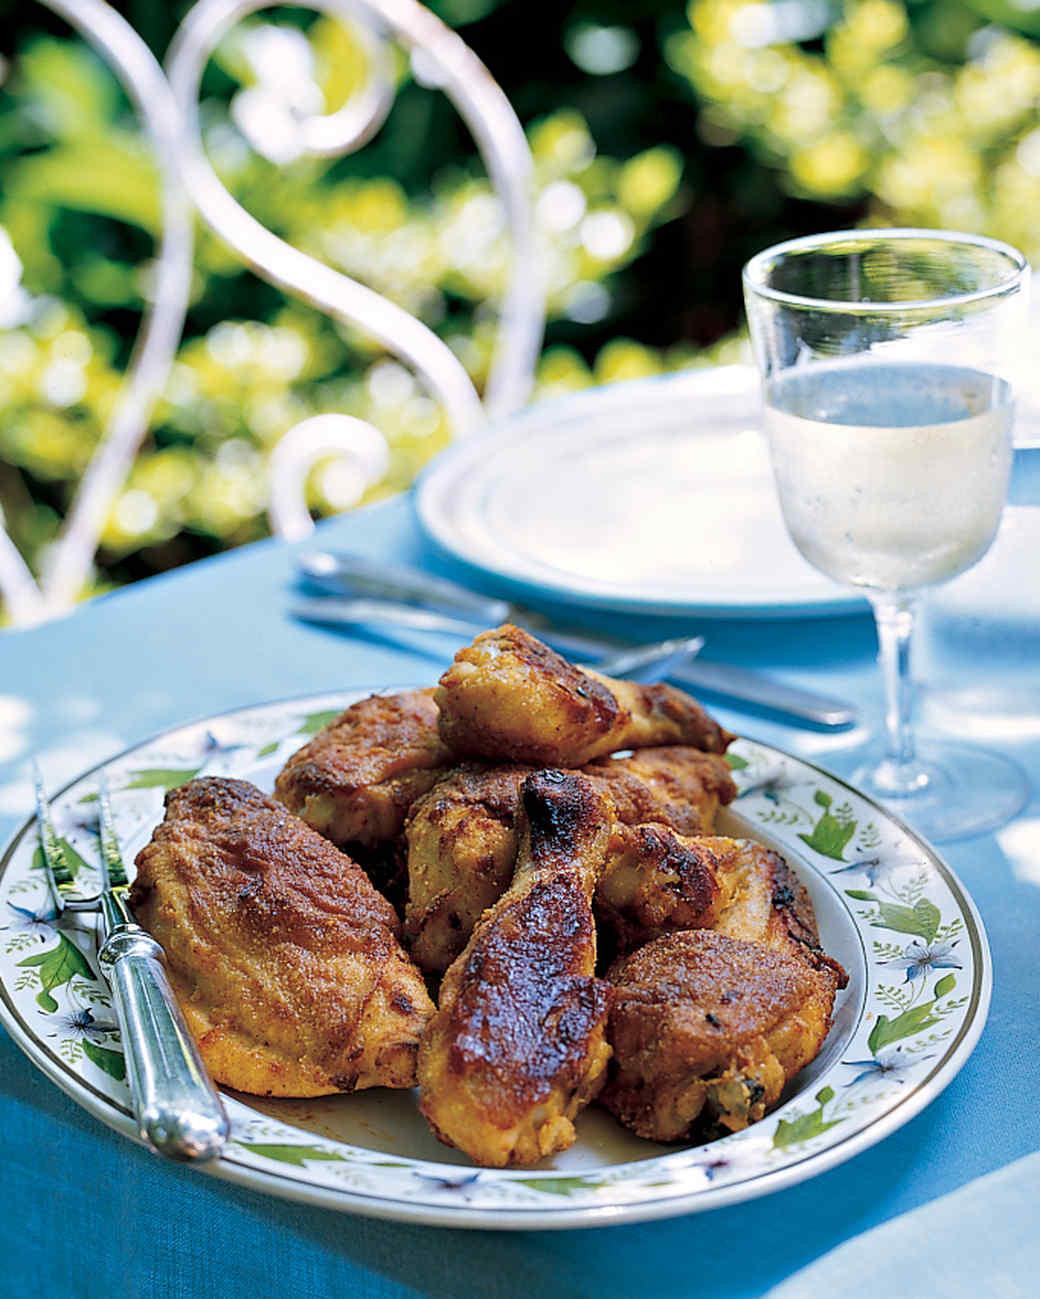 Fried Chicken Marinade  Oven Fried Chicken with Tabasco Garlic Marinade Recipe